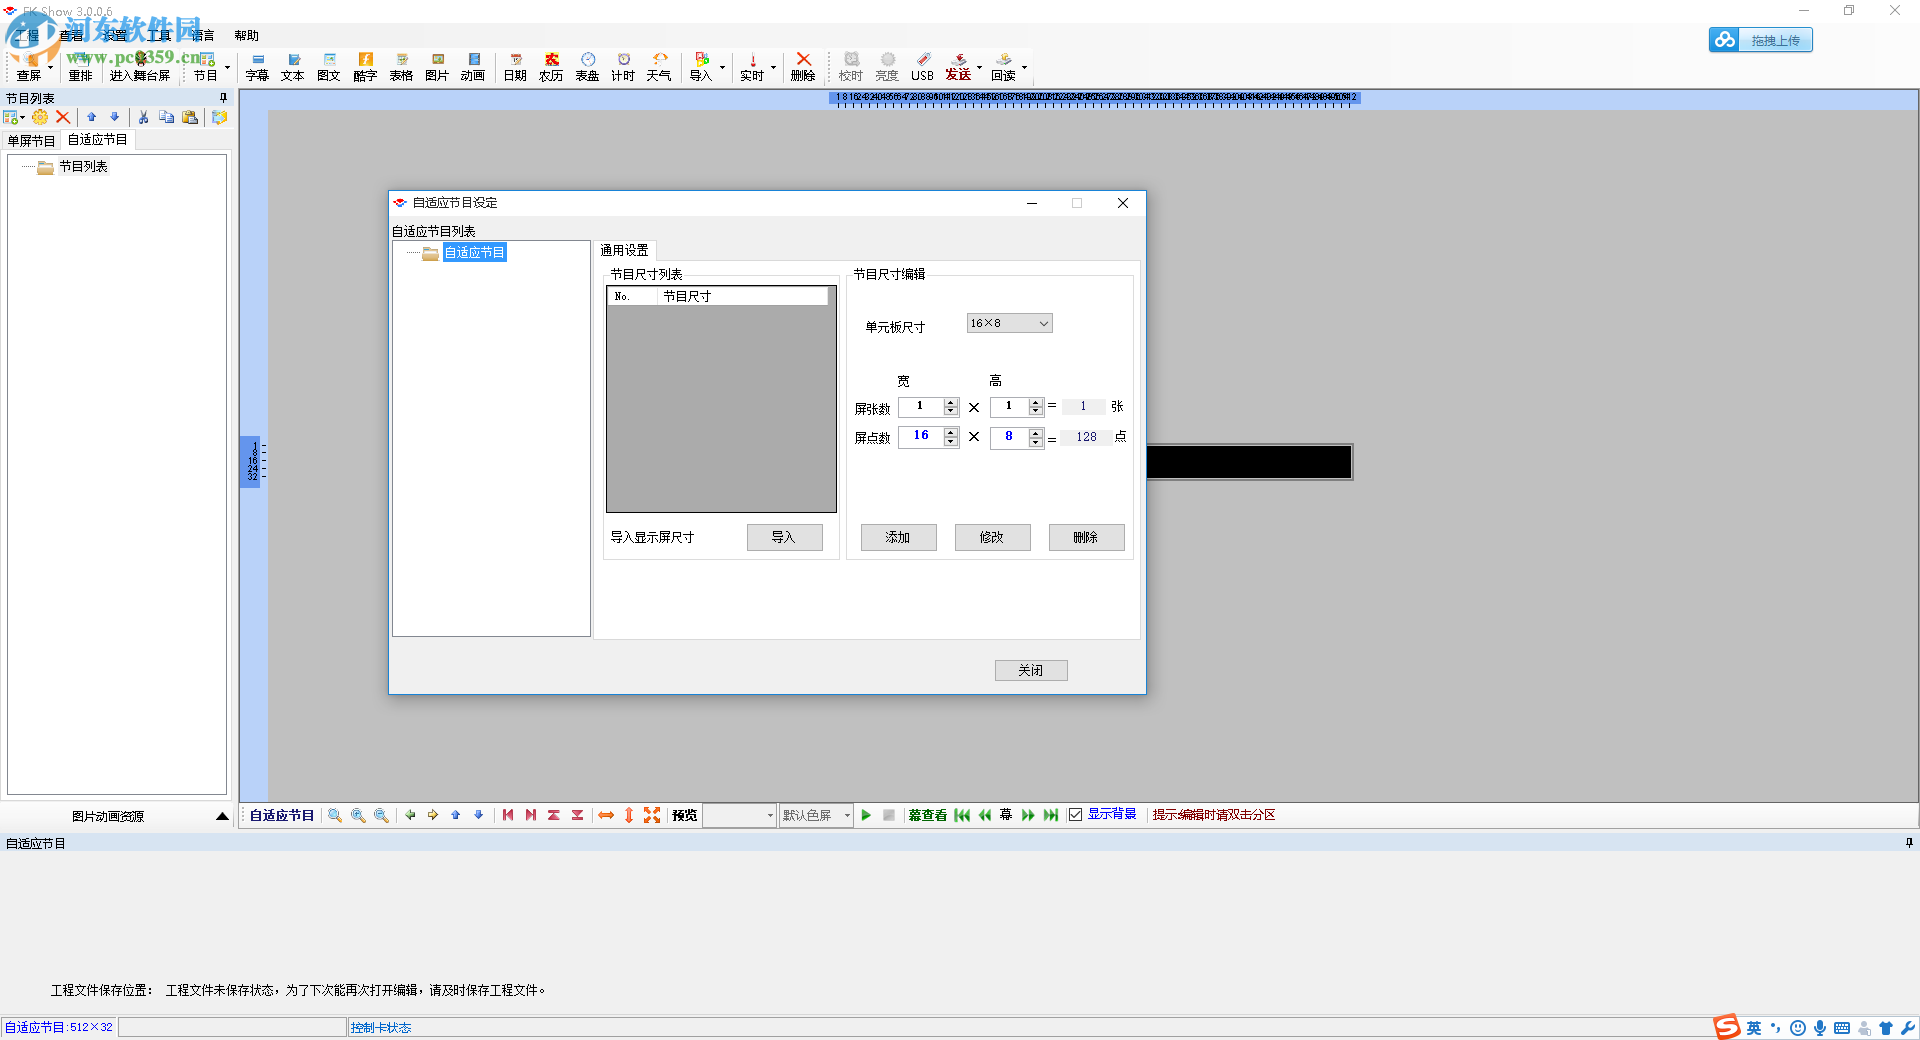 fk show软件(led显示屏软件编辑工具) 4.4.0.0 官方版